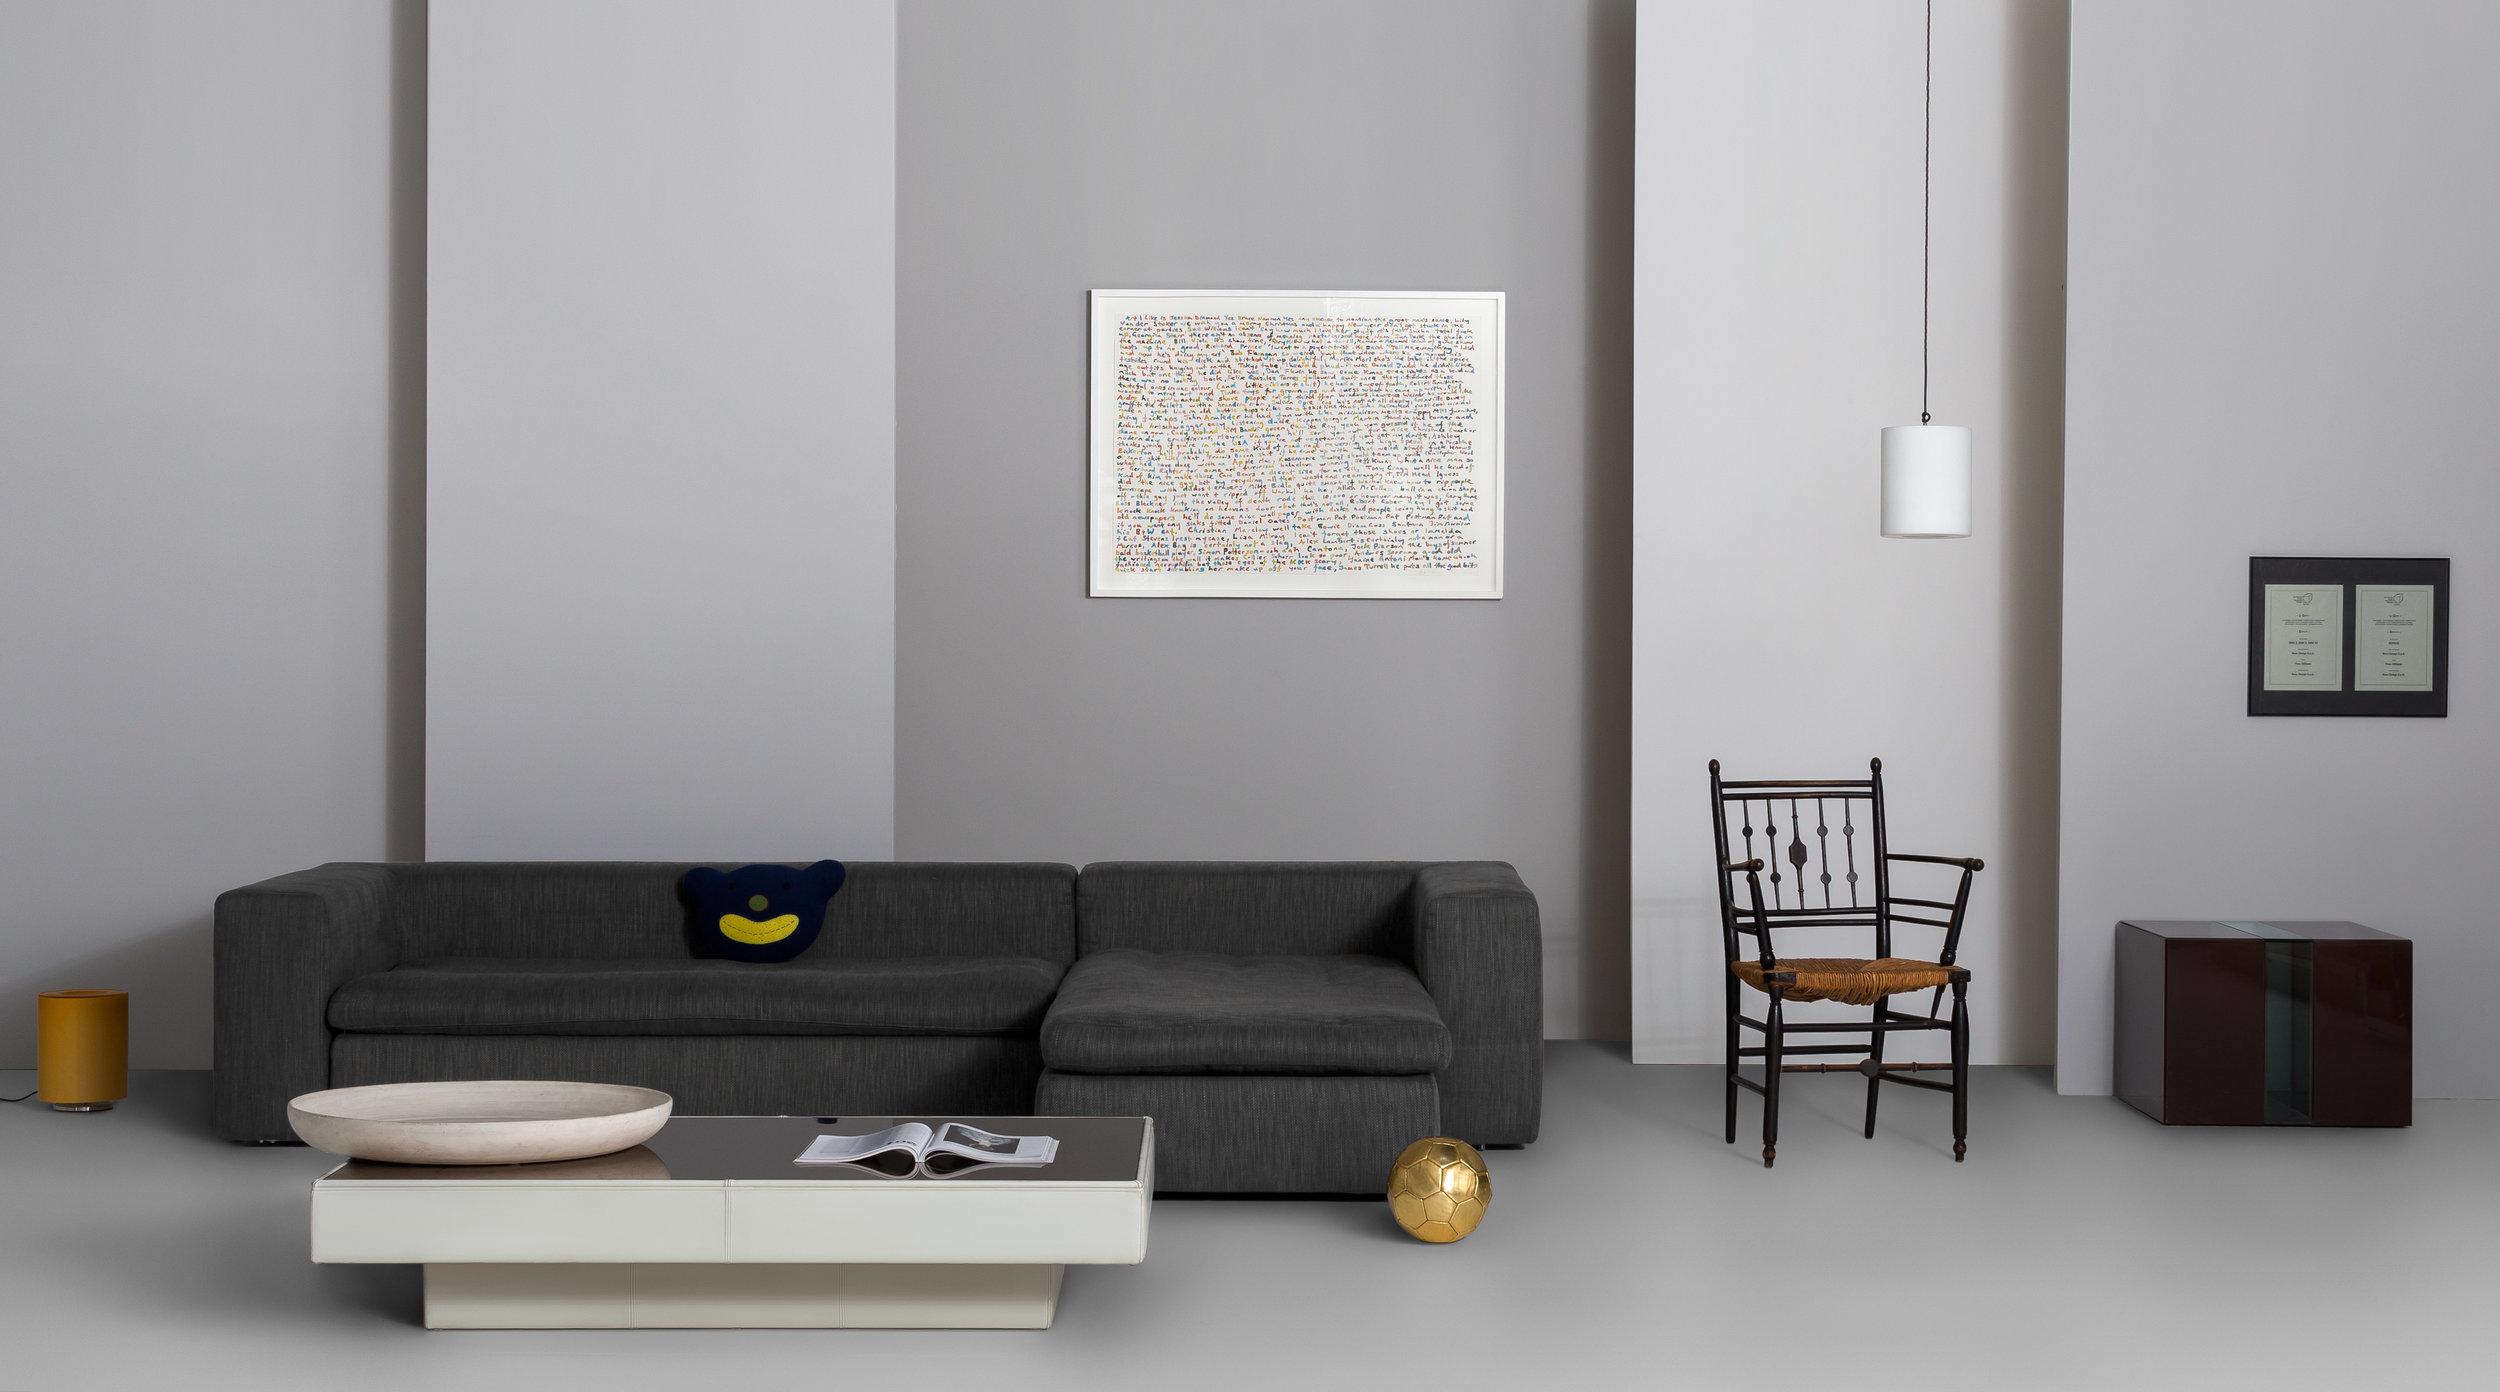 Theo-Williams-Product-Industrial-Design-Furniture.jpg